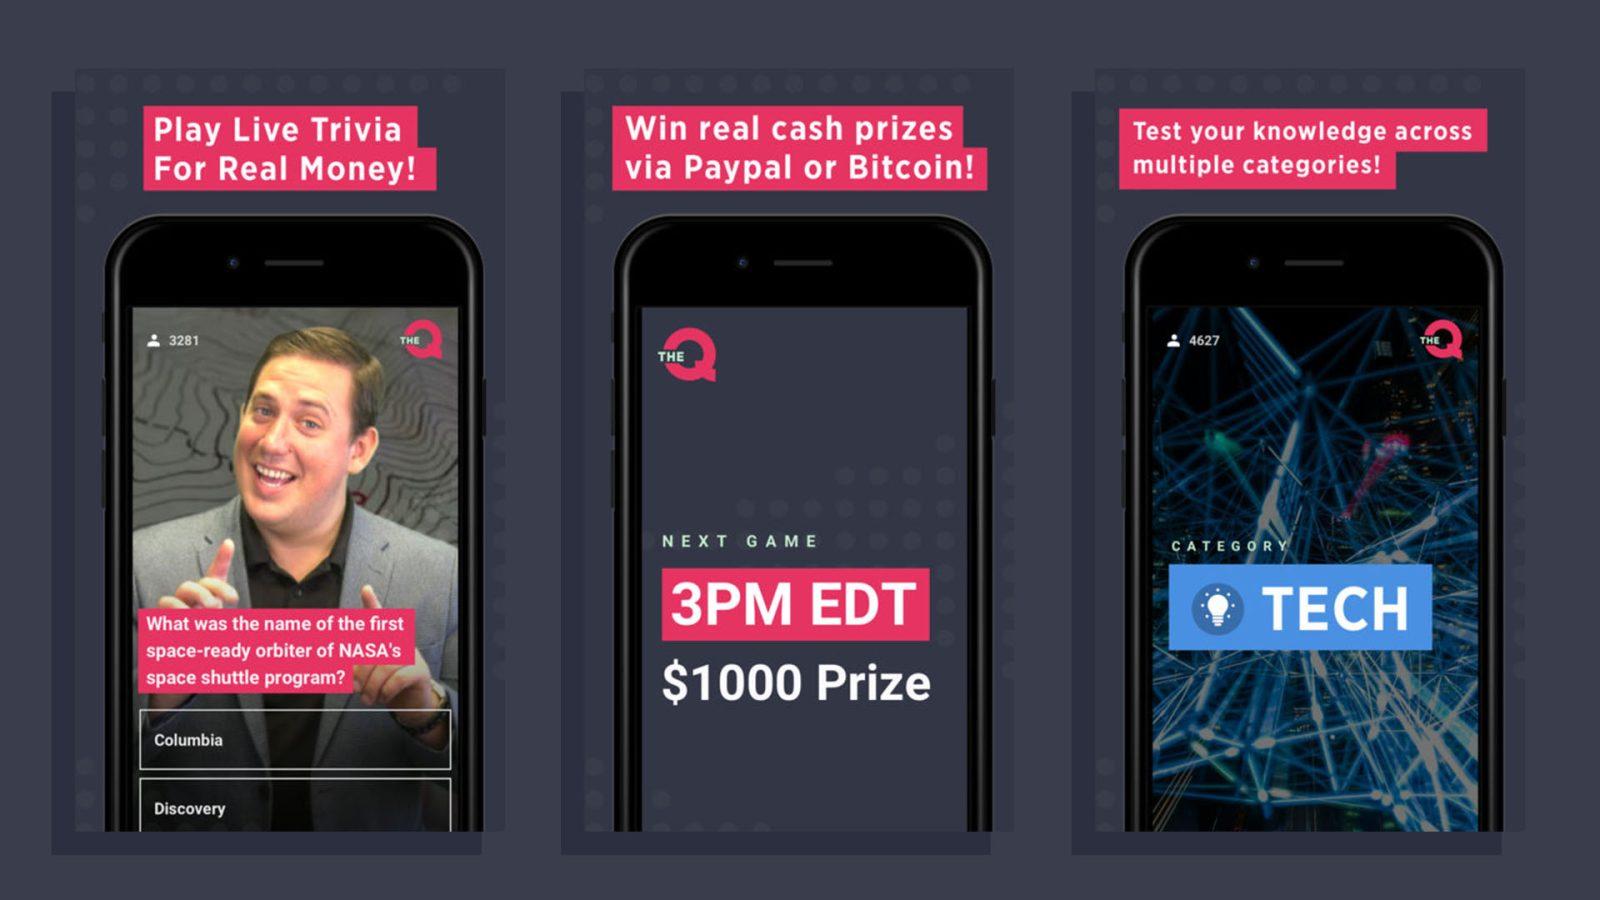 yik yak developer returns with the q trivia live game show app leaving public beta tomorrow